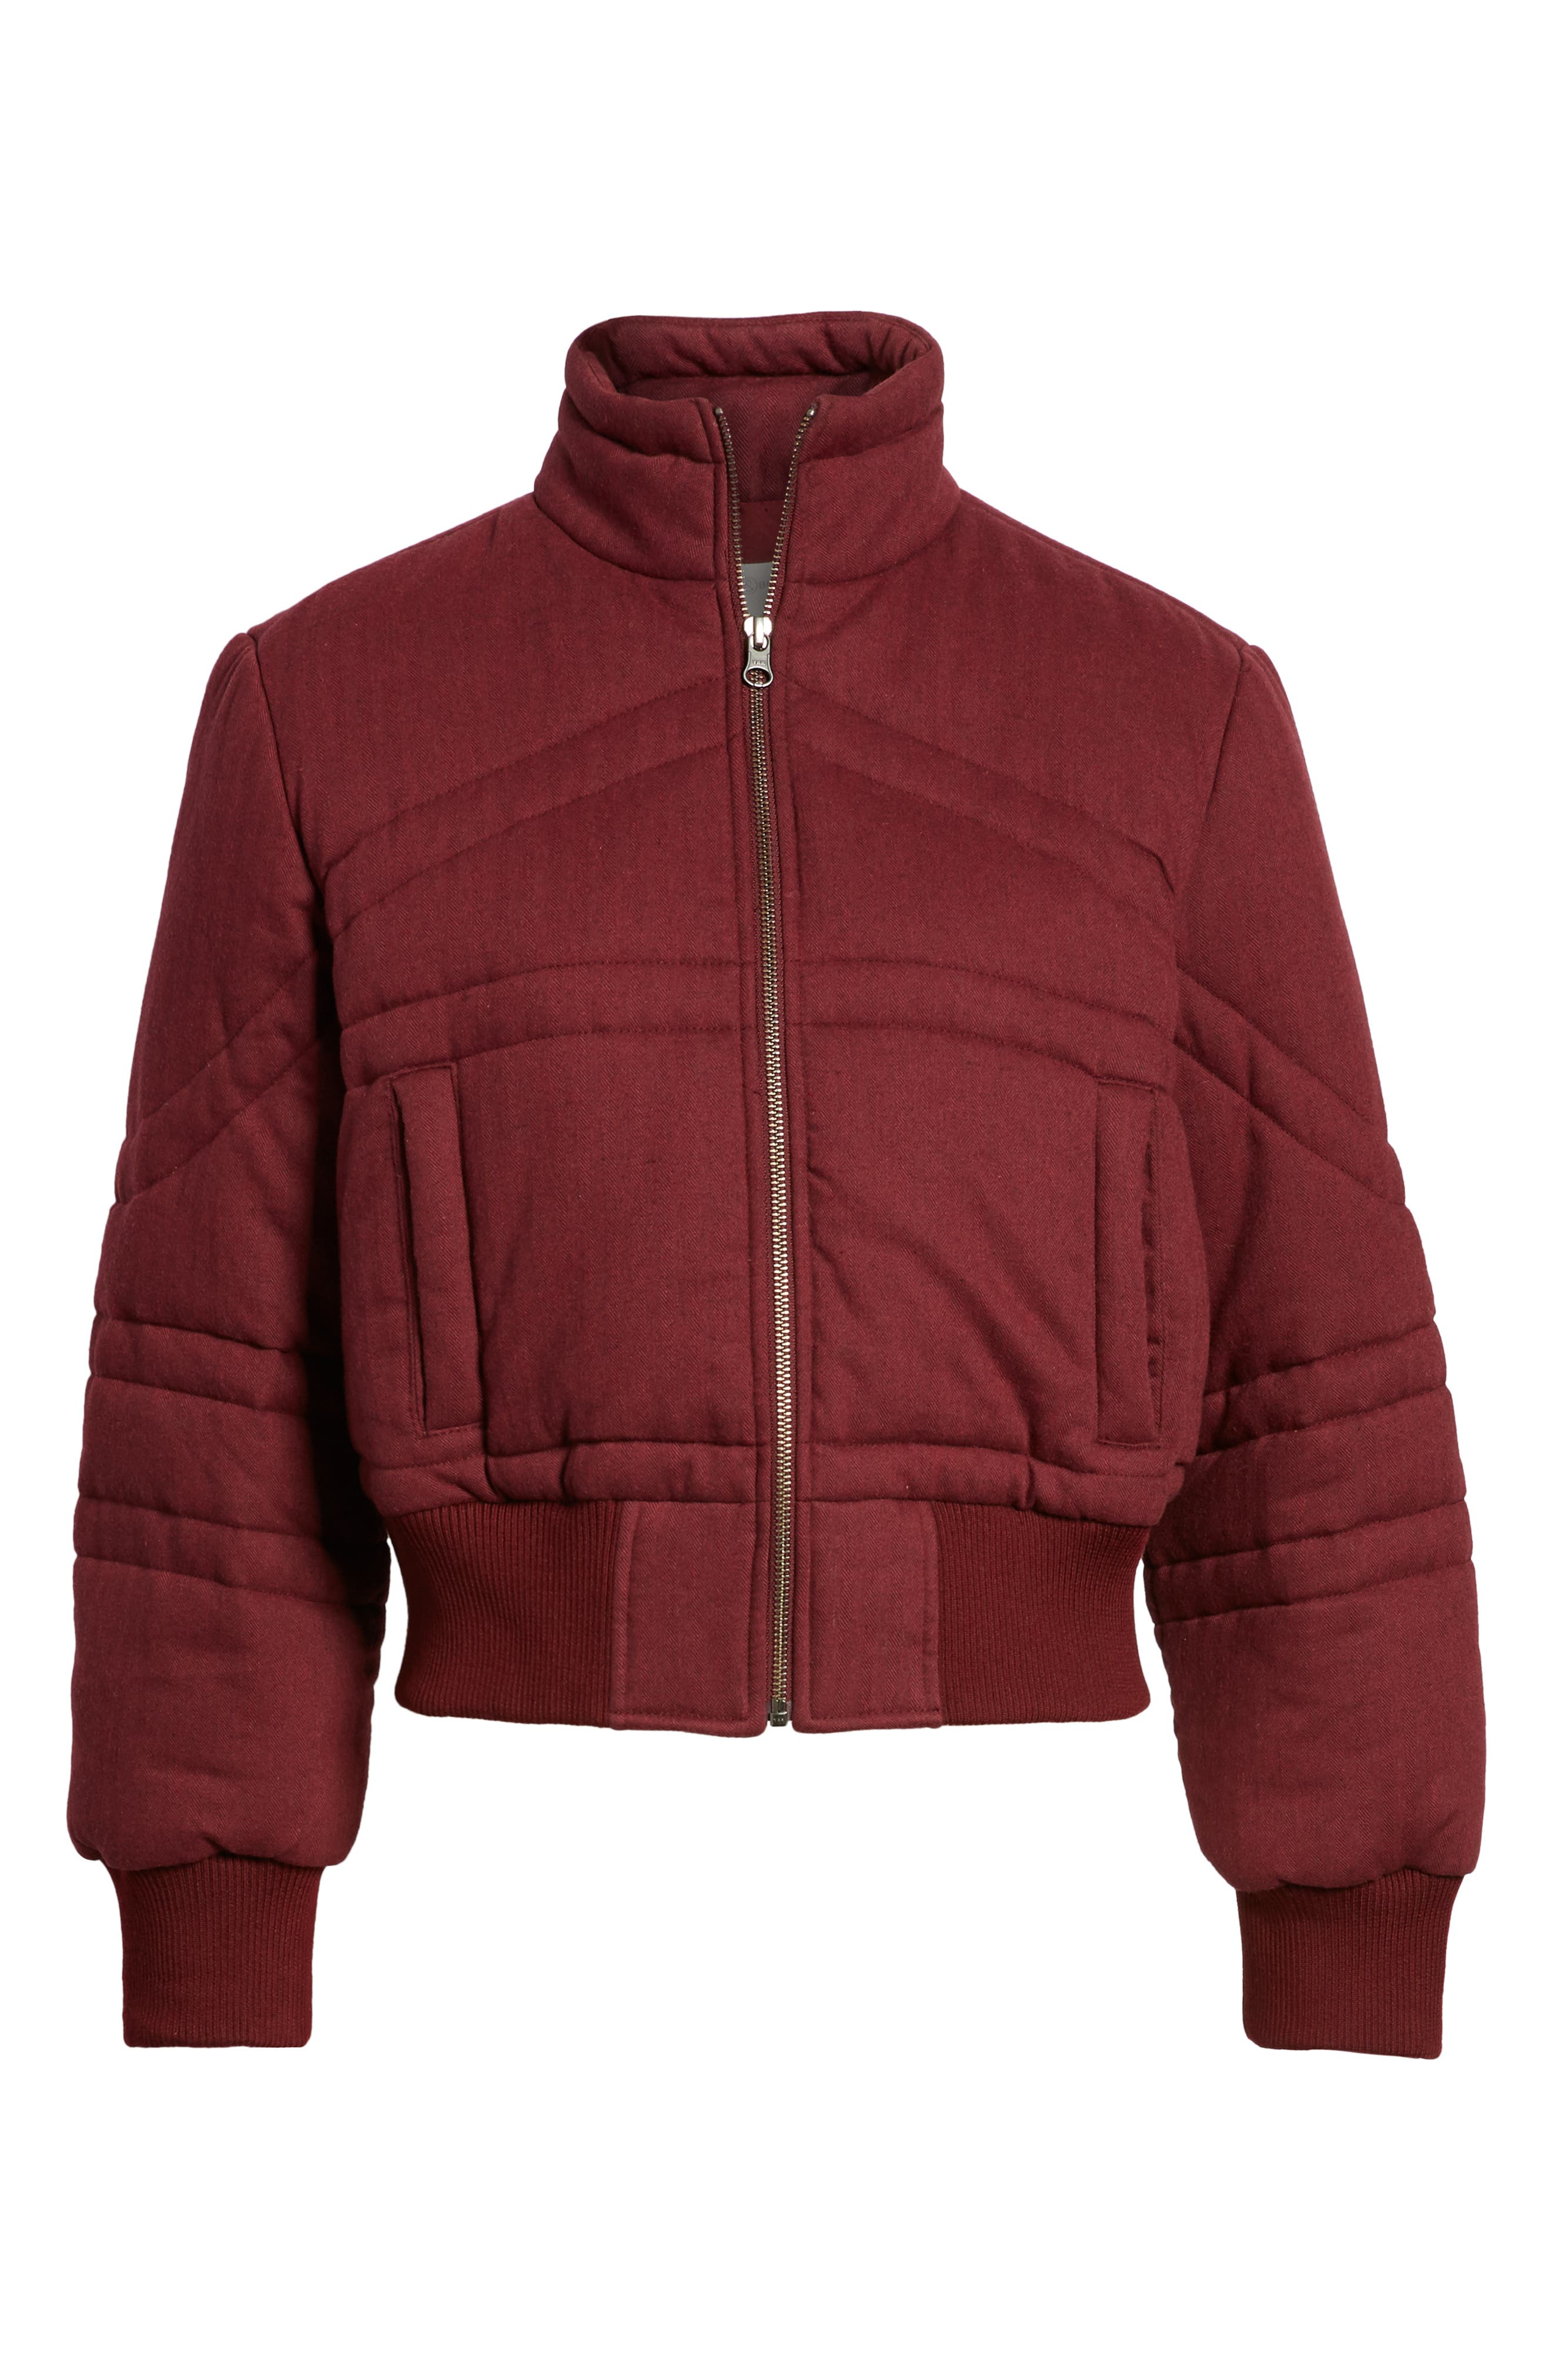 TREASURE & BOND, Flannel Crop Puffer Jacket, Alternate thumbnail 5, color, RED TANNIN HEATHER